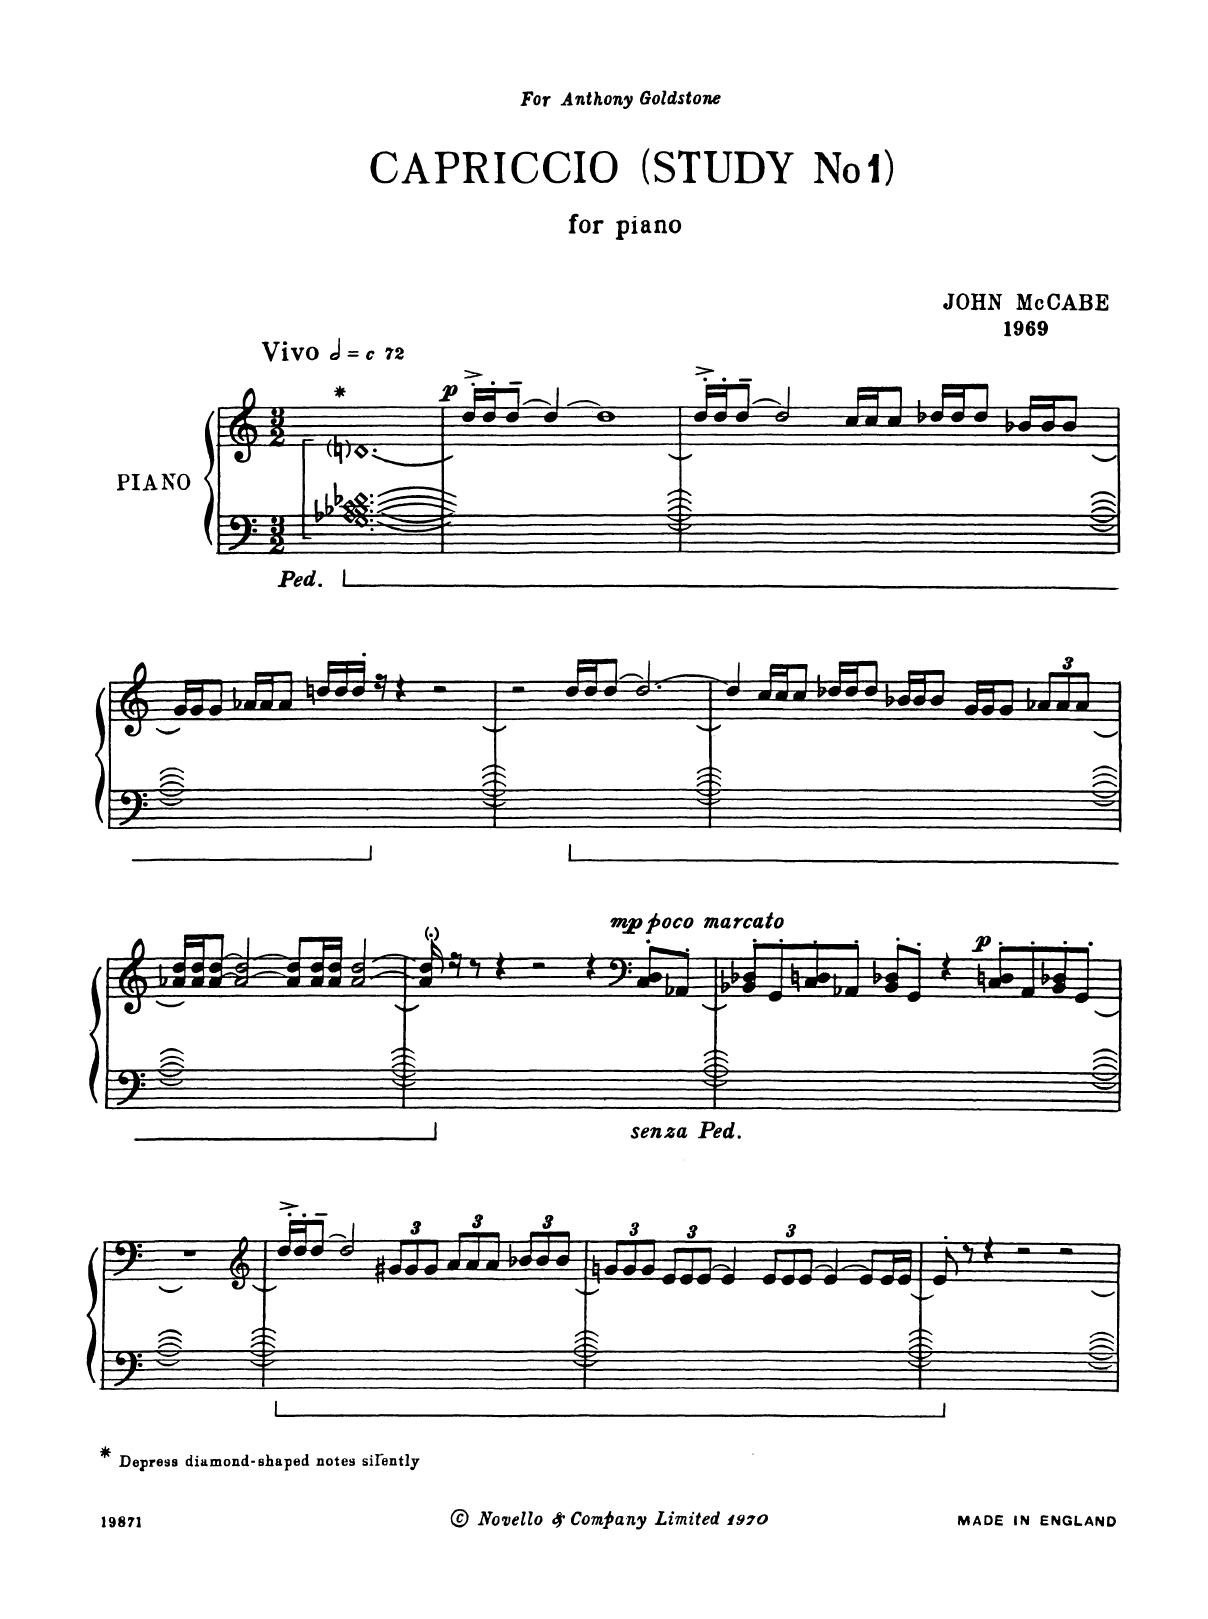 Capriccio (Study No. 1) Sheet Music